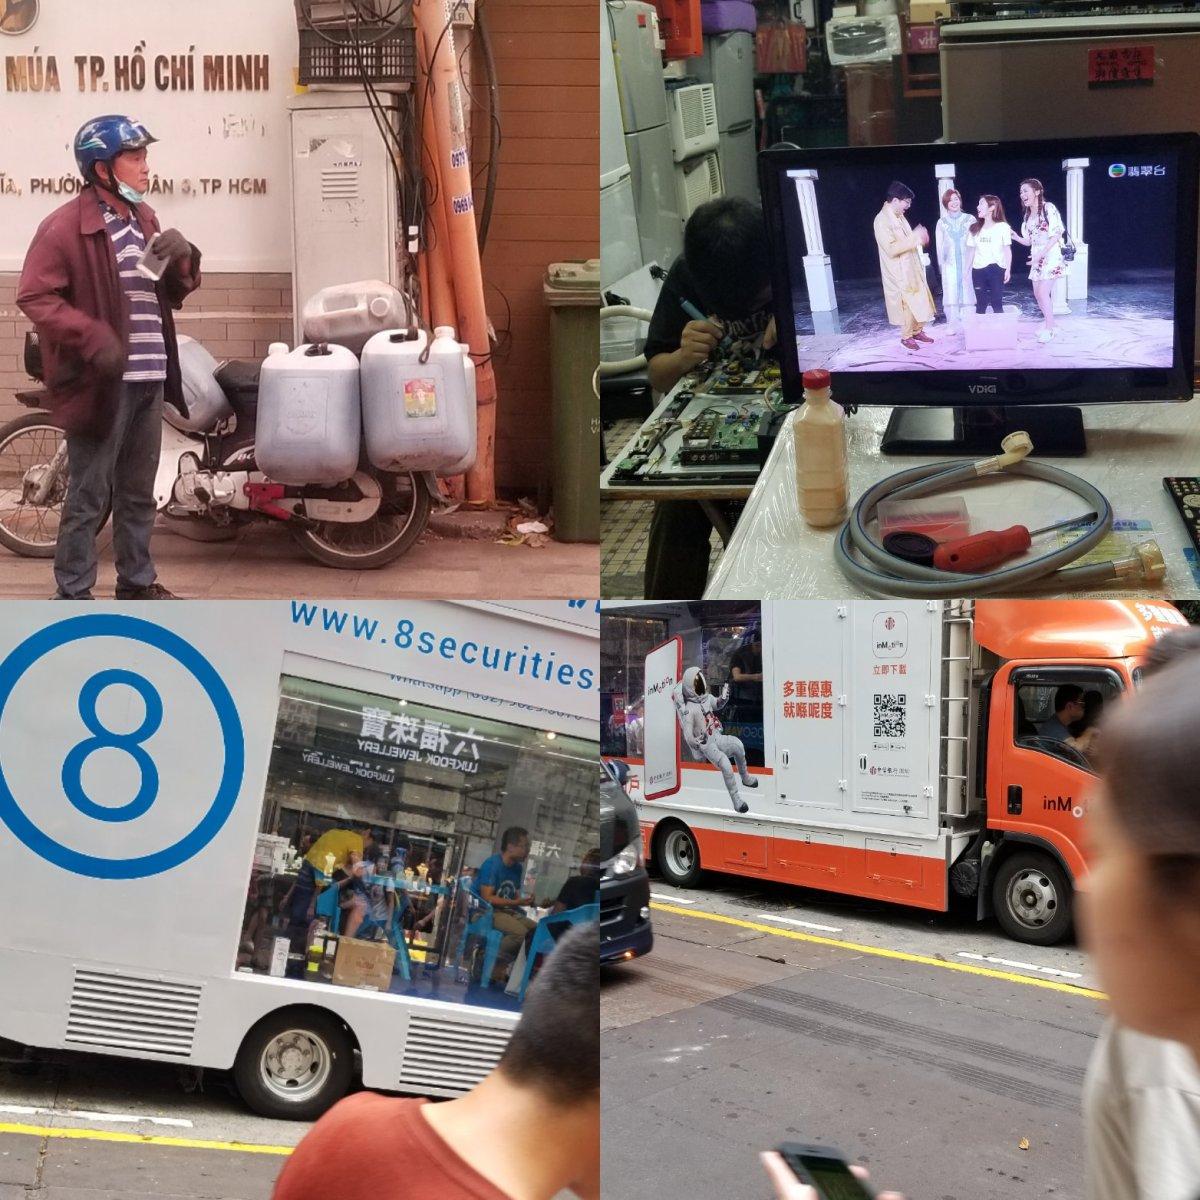 Asian sidewalk entrepreneurship steps up with service,convenience